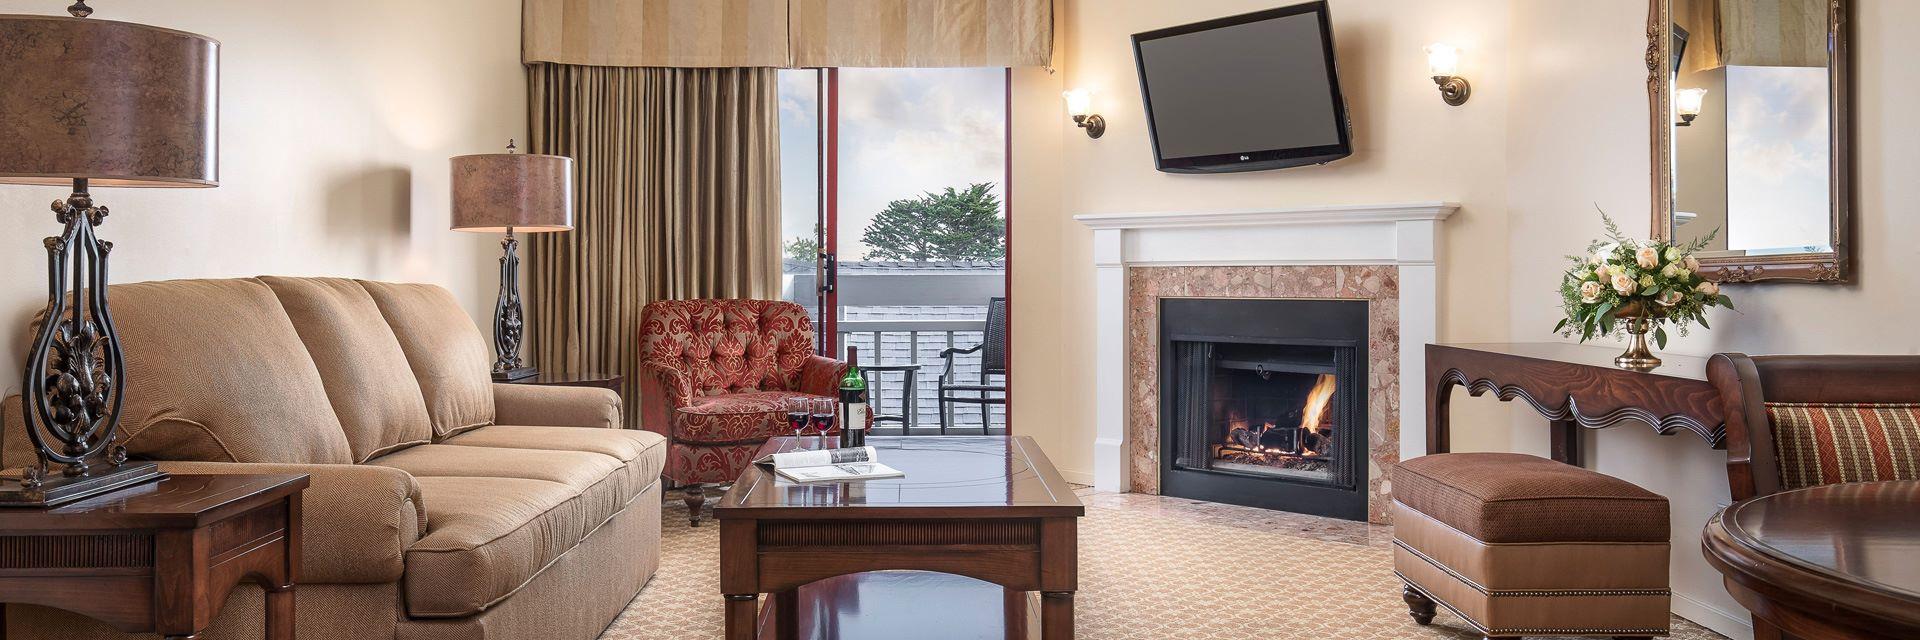 Best Rate Guarantee of Hotel Victorian Inn Monterey